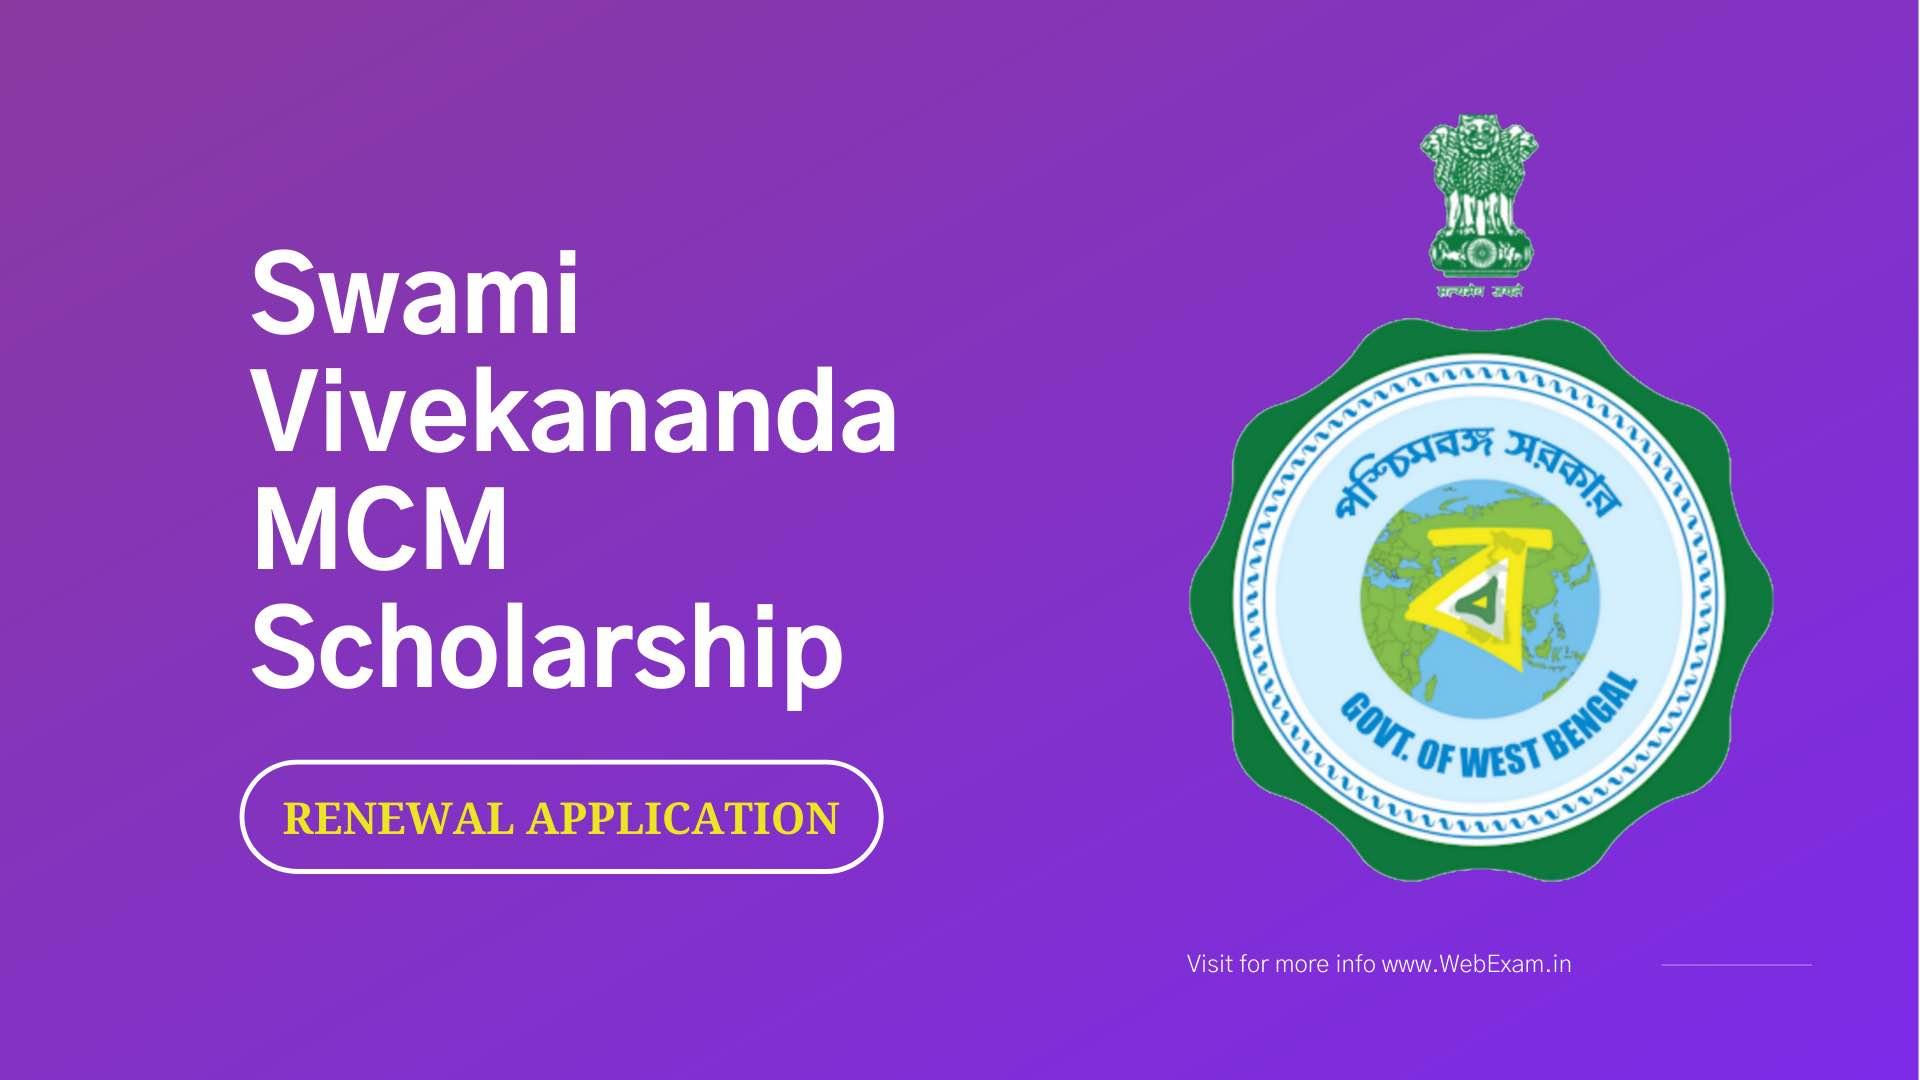 Swami Vivekananda Scholarship renewal